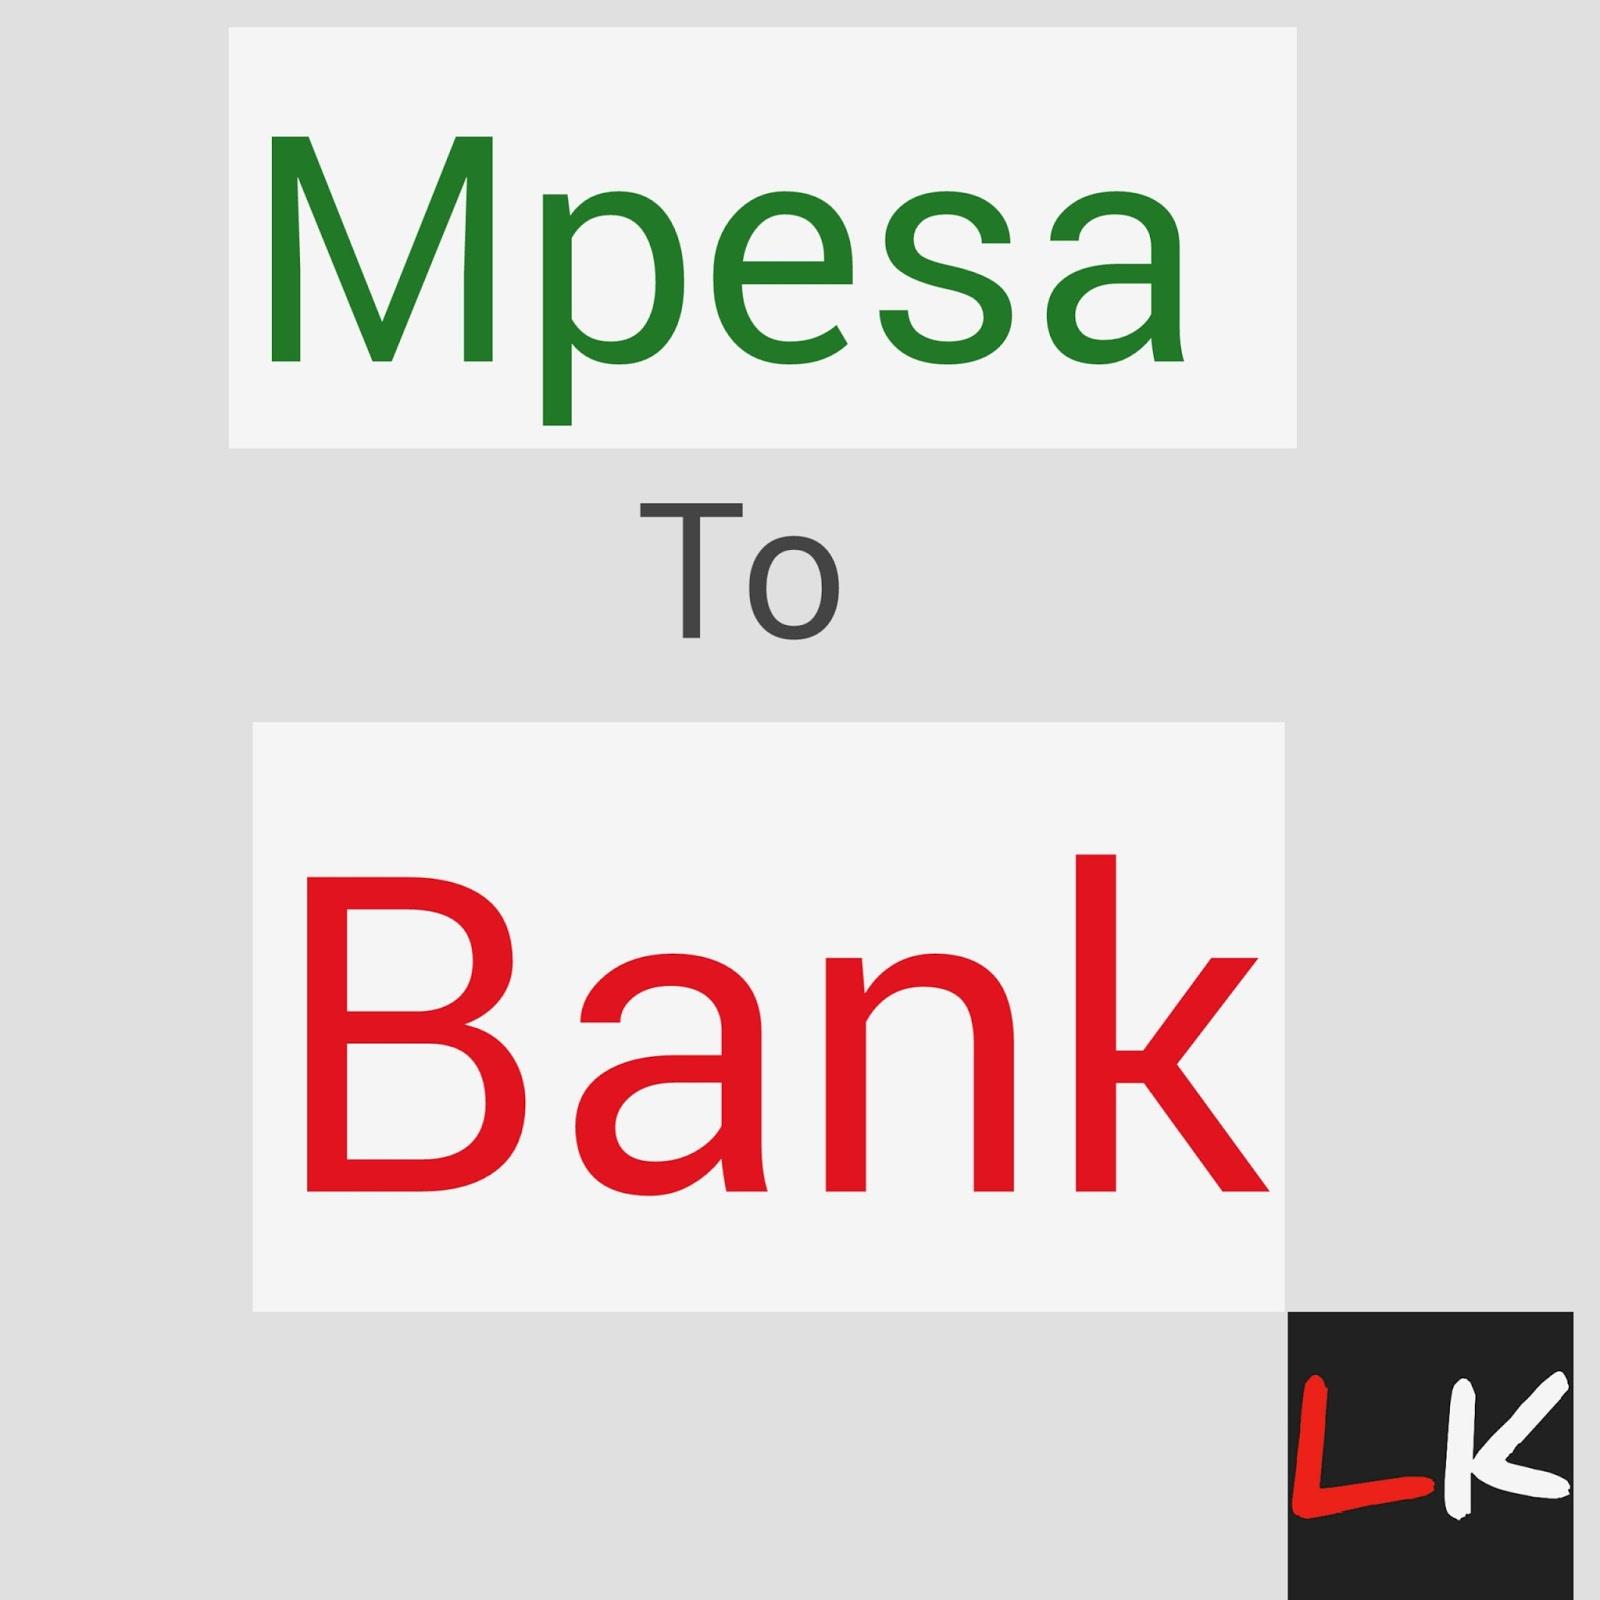 how to transfer m pesa money to bank account in kenya loans kenya blog rh loans info ke transfer money to kenya from australia wiring money to kenya